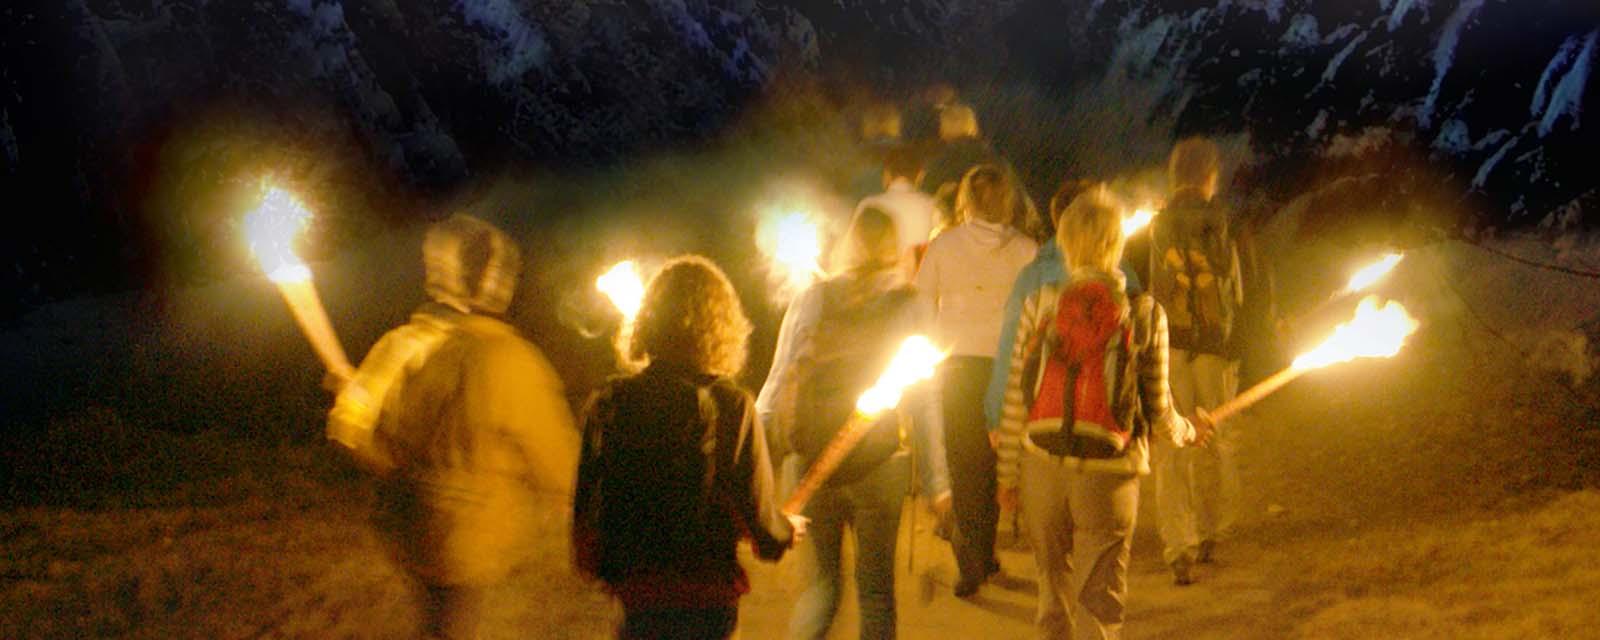 Waldcafe, Teuchelwald, Freudenstadt, Feiern